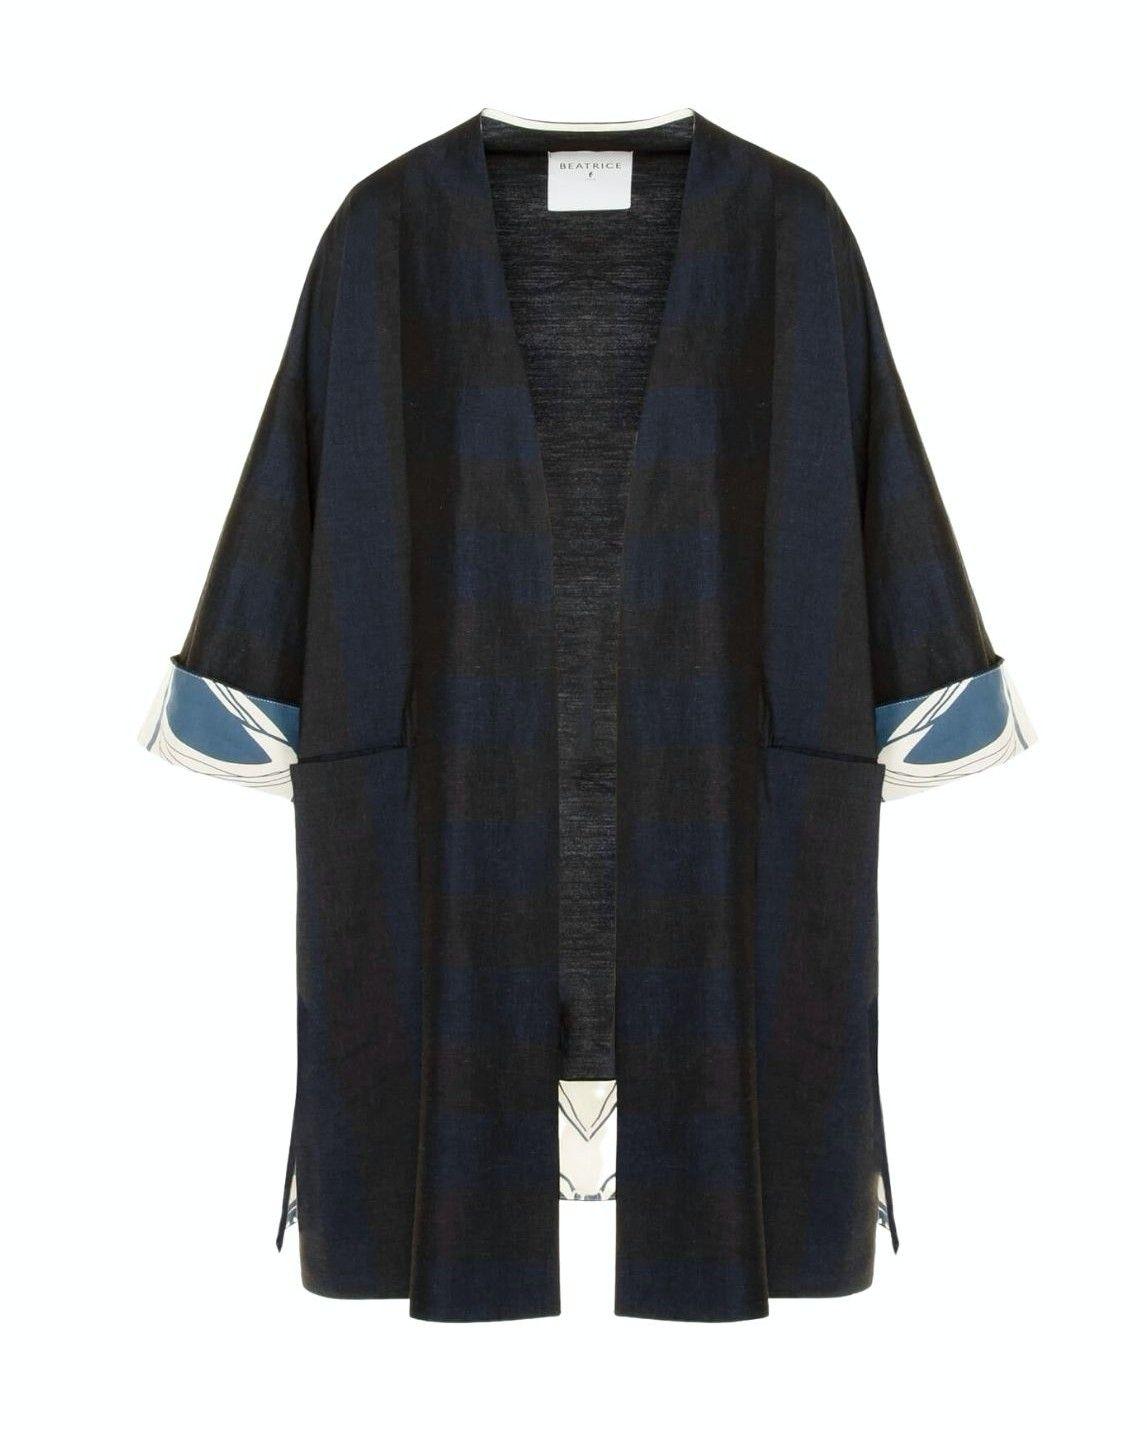 BEATRICE.B - Damen Kimono - Smoky Black